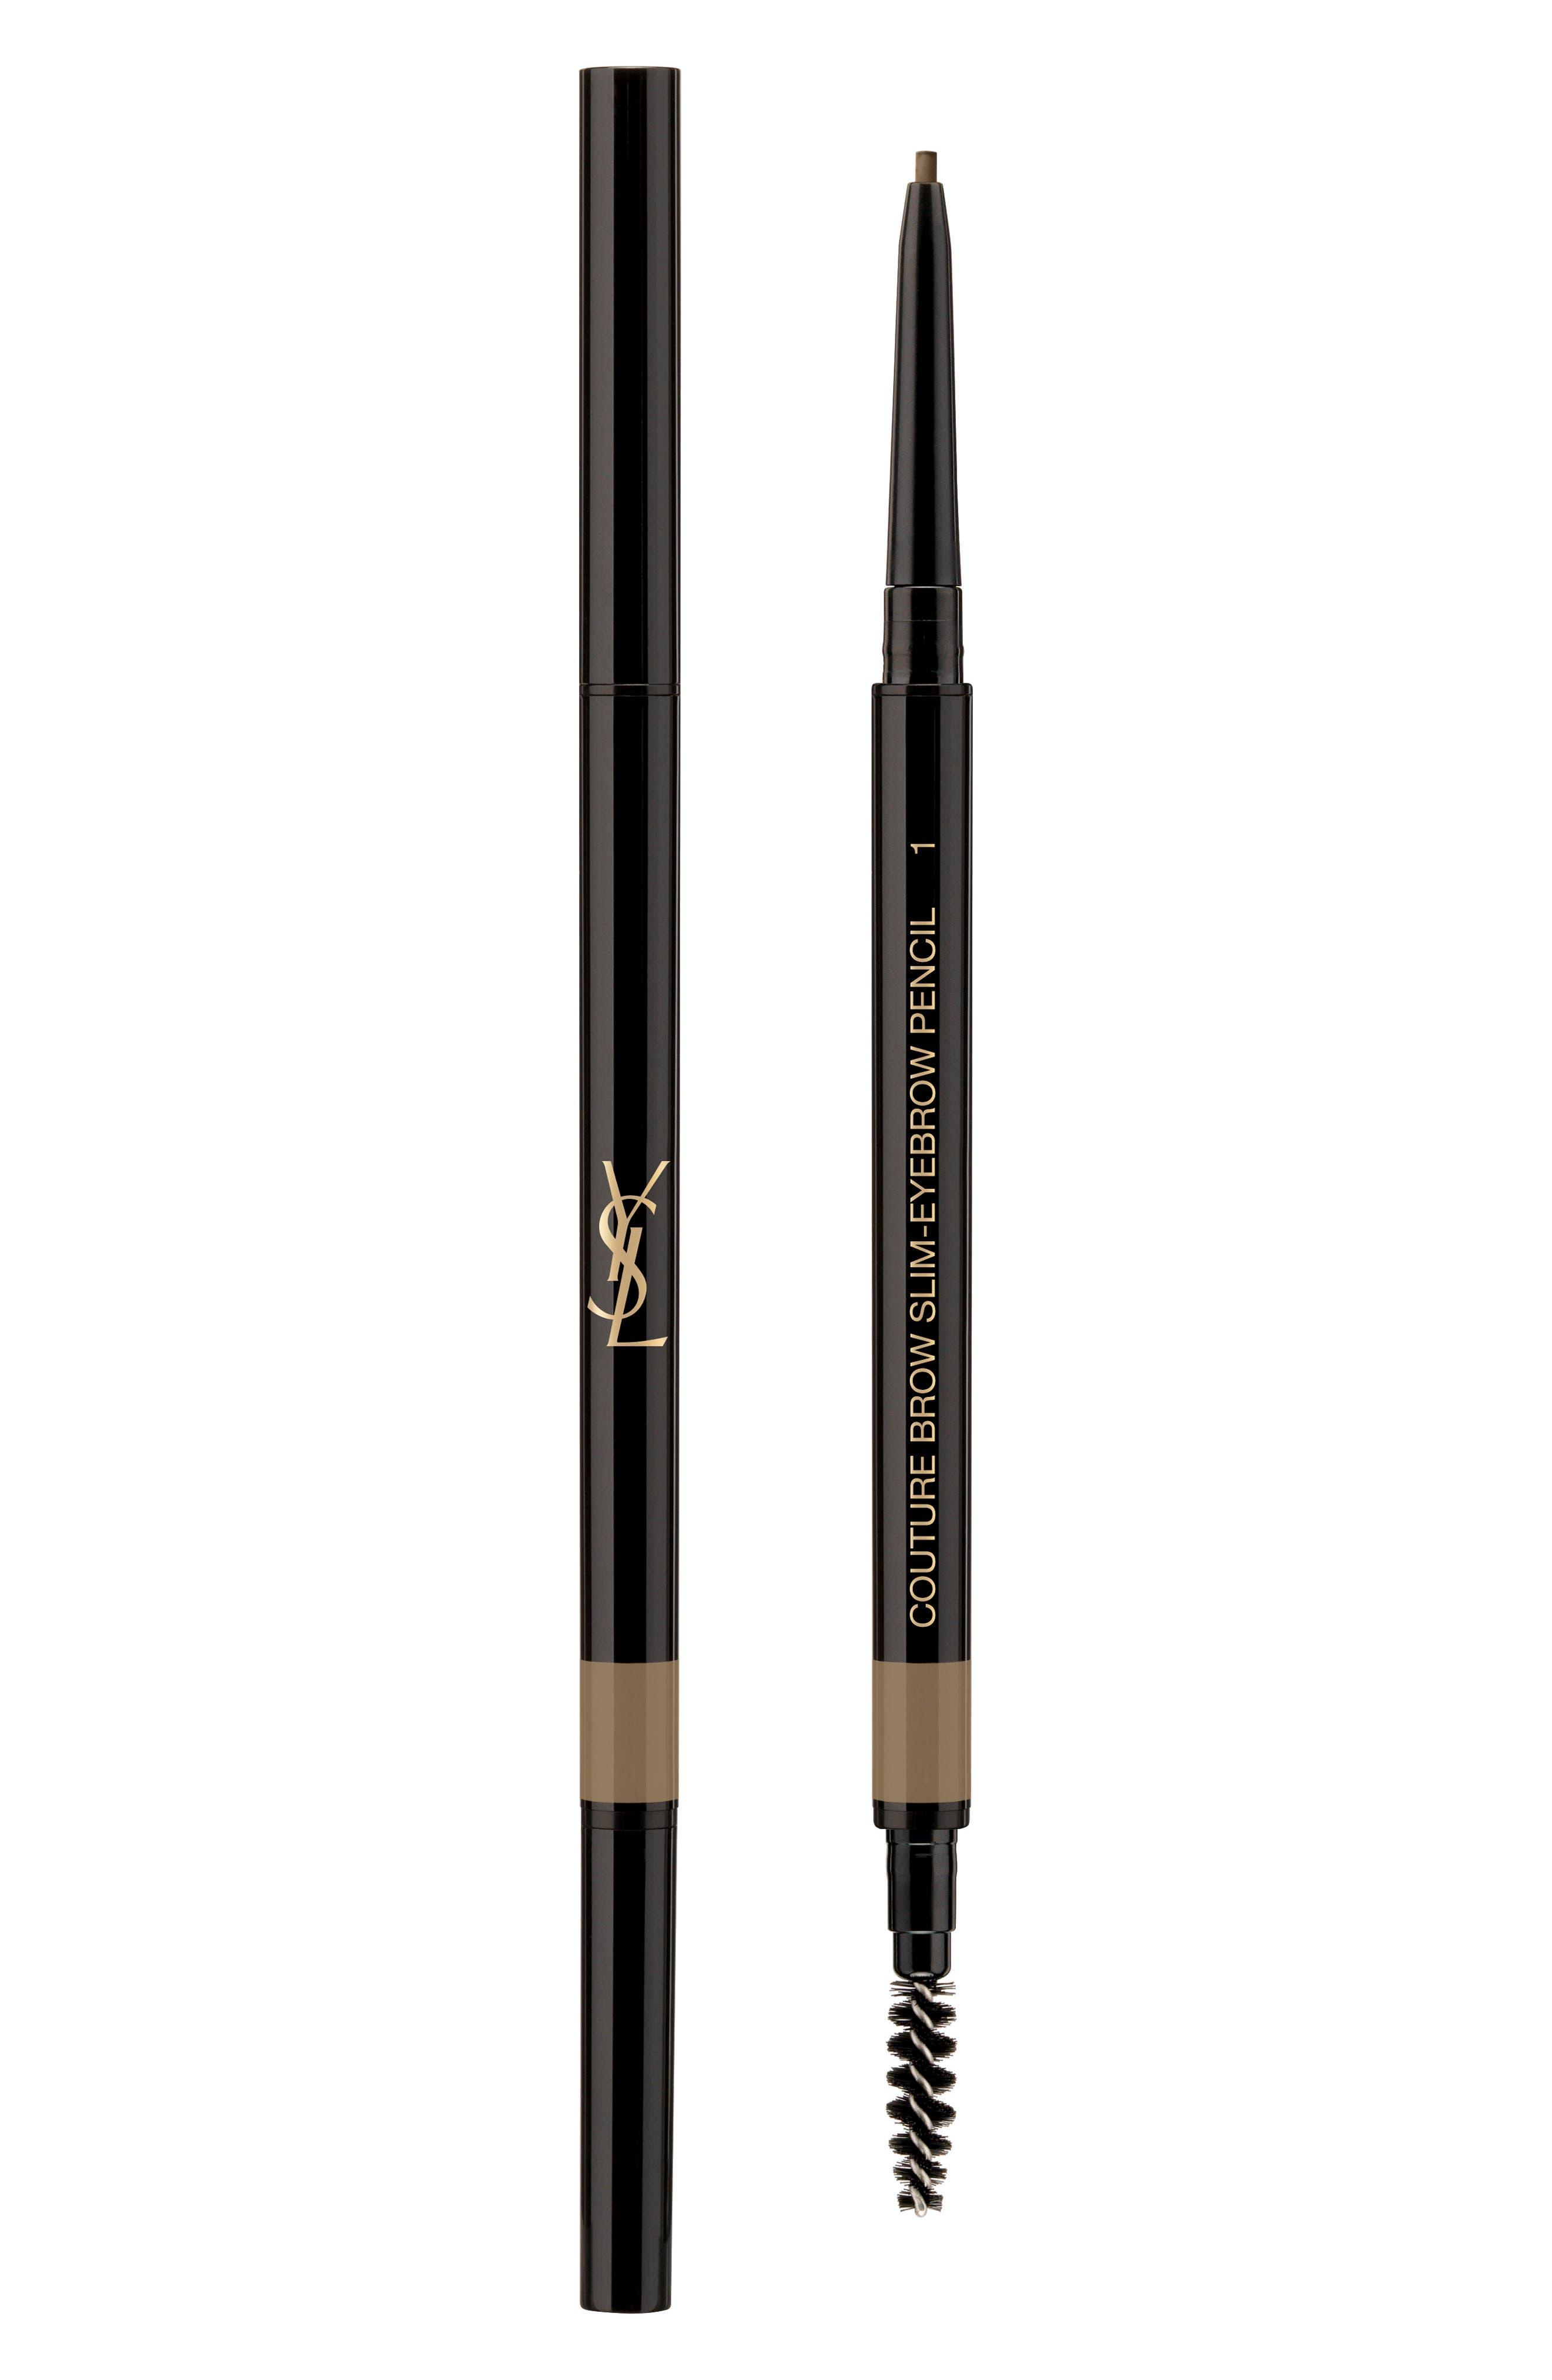 YVES SAINT LAURENT, Couture Brow Slim Eyebrow Pencil, Main thumbnail 1, color, 01 ASH BROWN